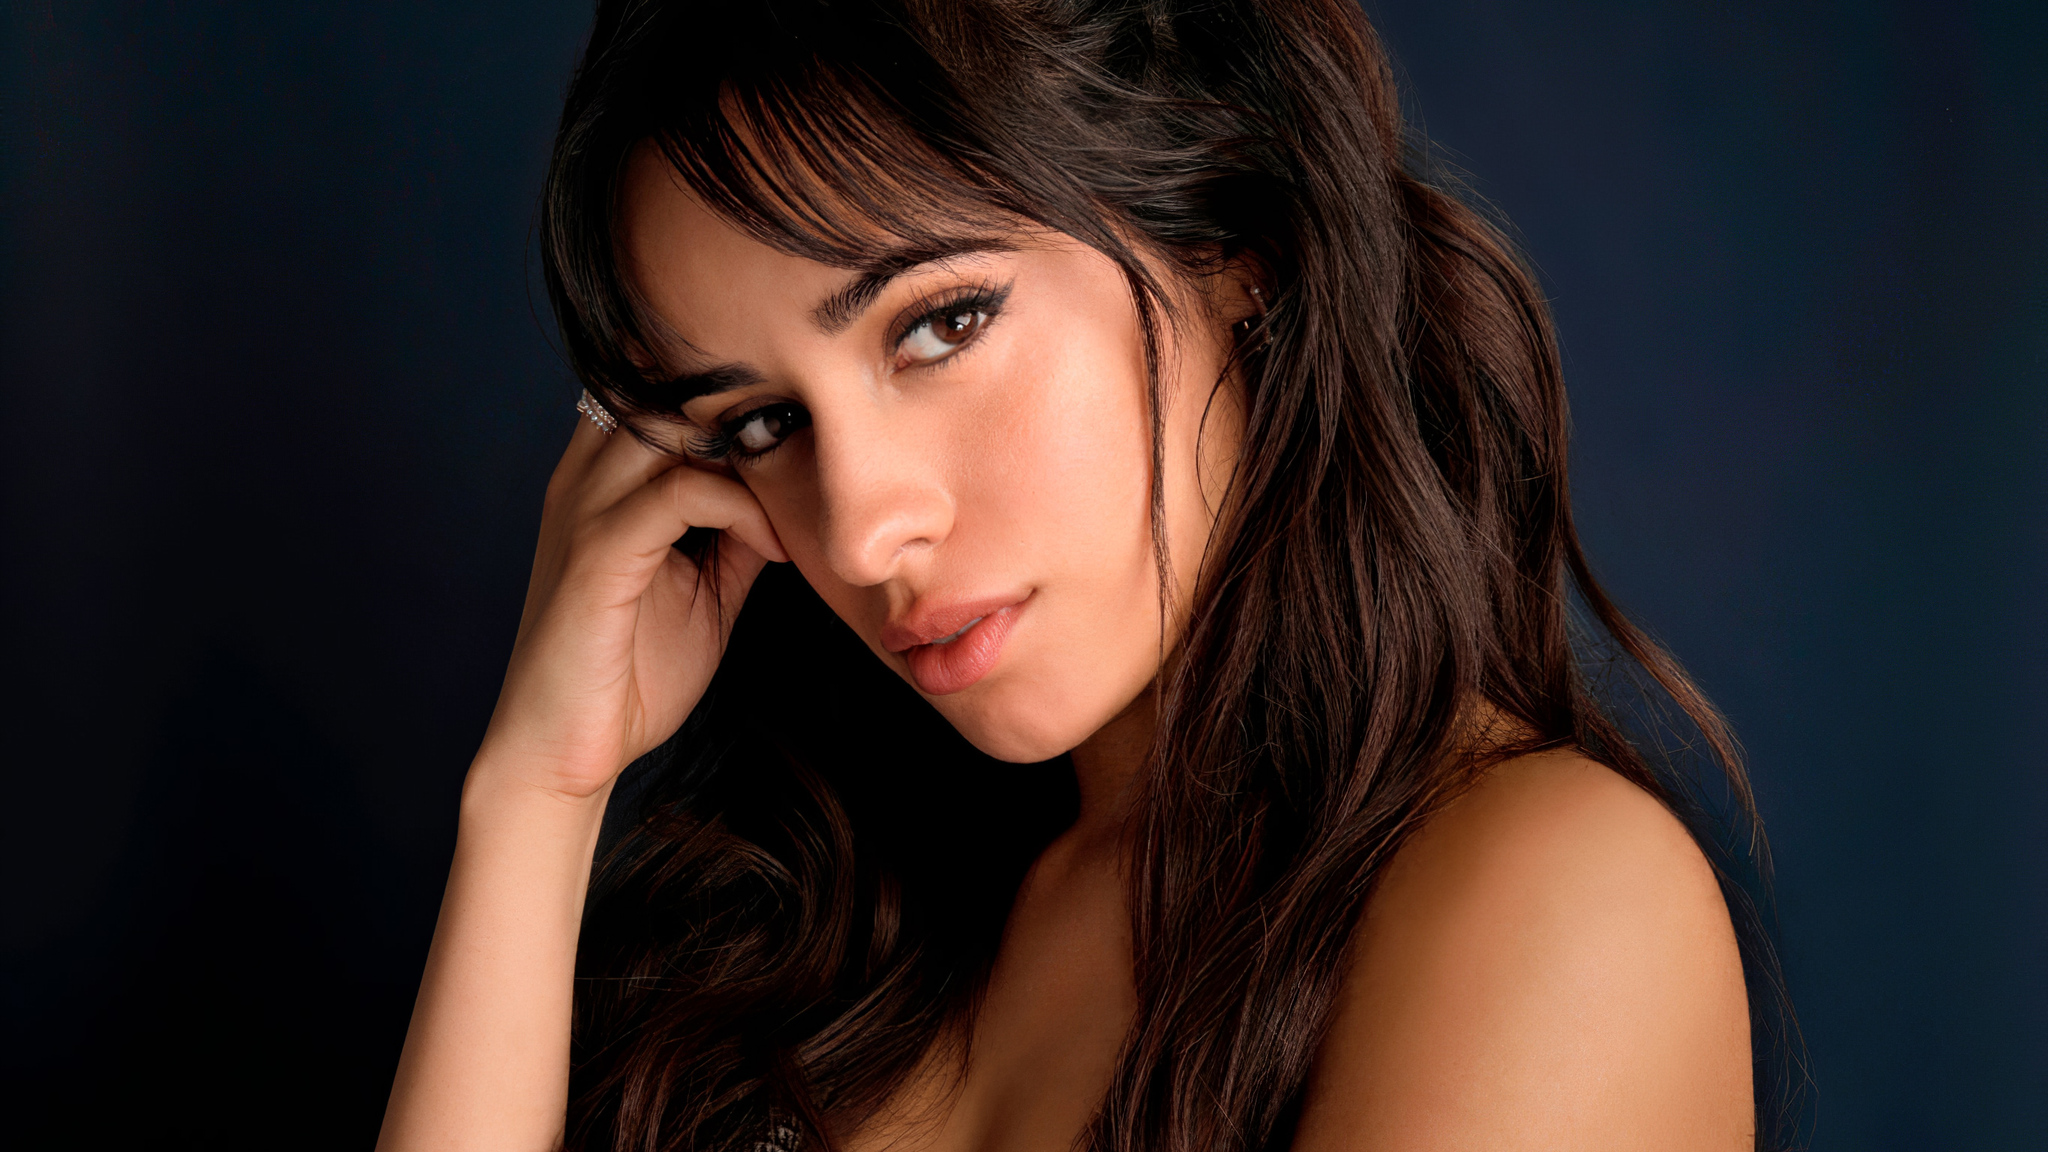 2020-camila-cabello-singer-f4.jpg